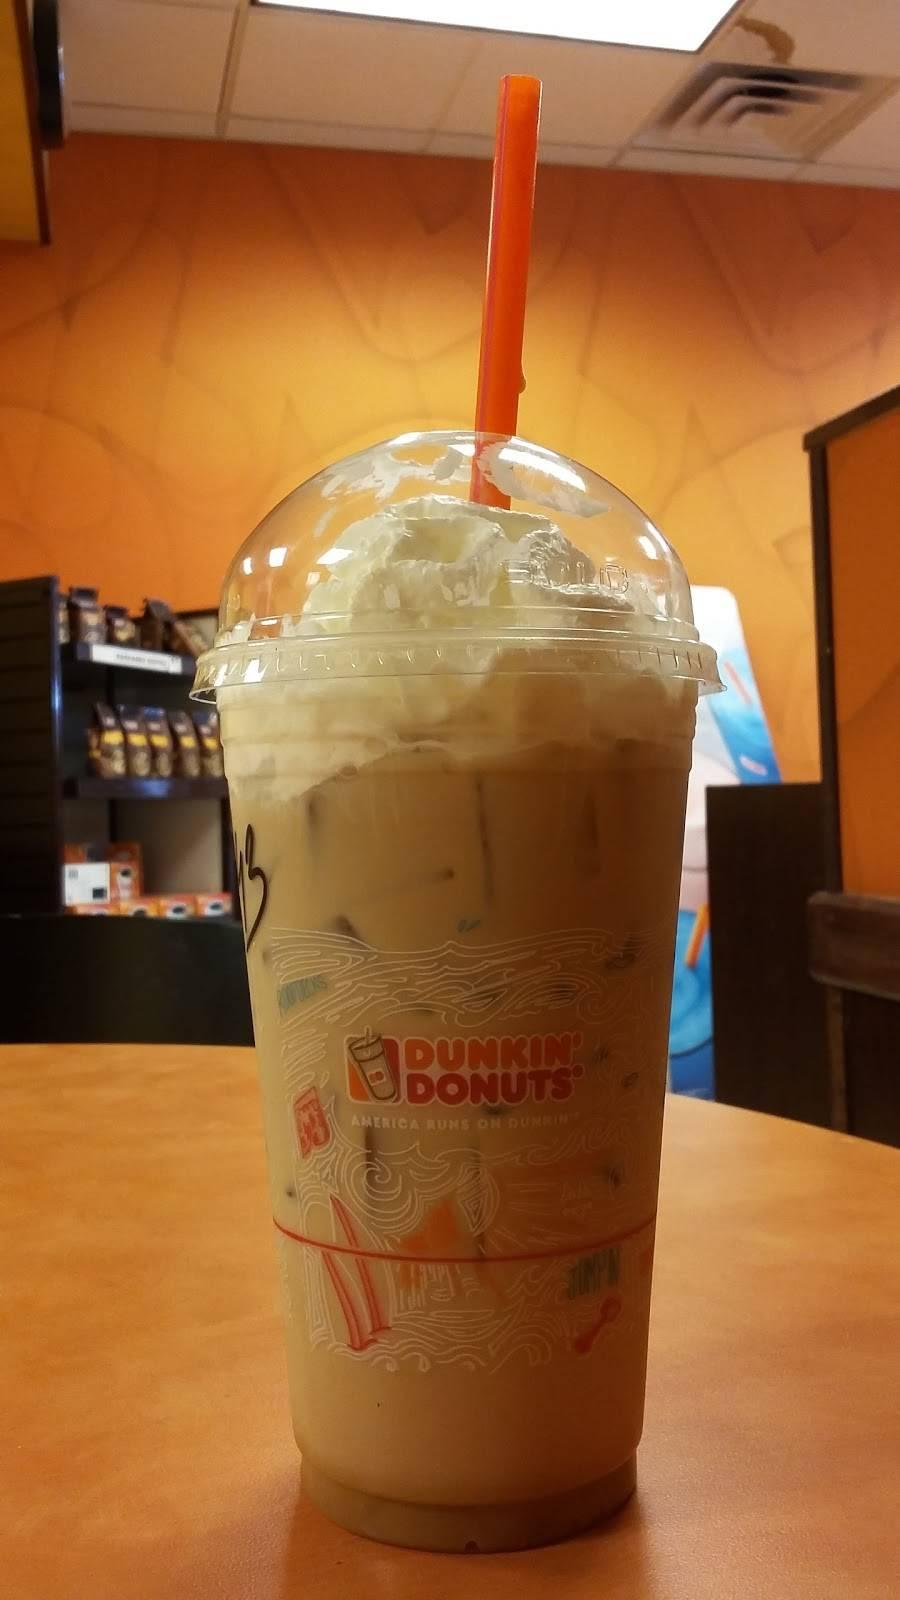 Dunkin Donuts | cafe | 1422 Kings Hwy, Brooklyn, NY 11229, USA | 7189982632 OR +1 718-998-2632